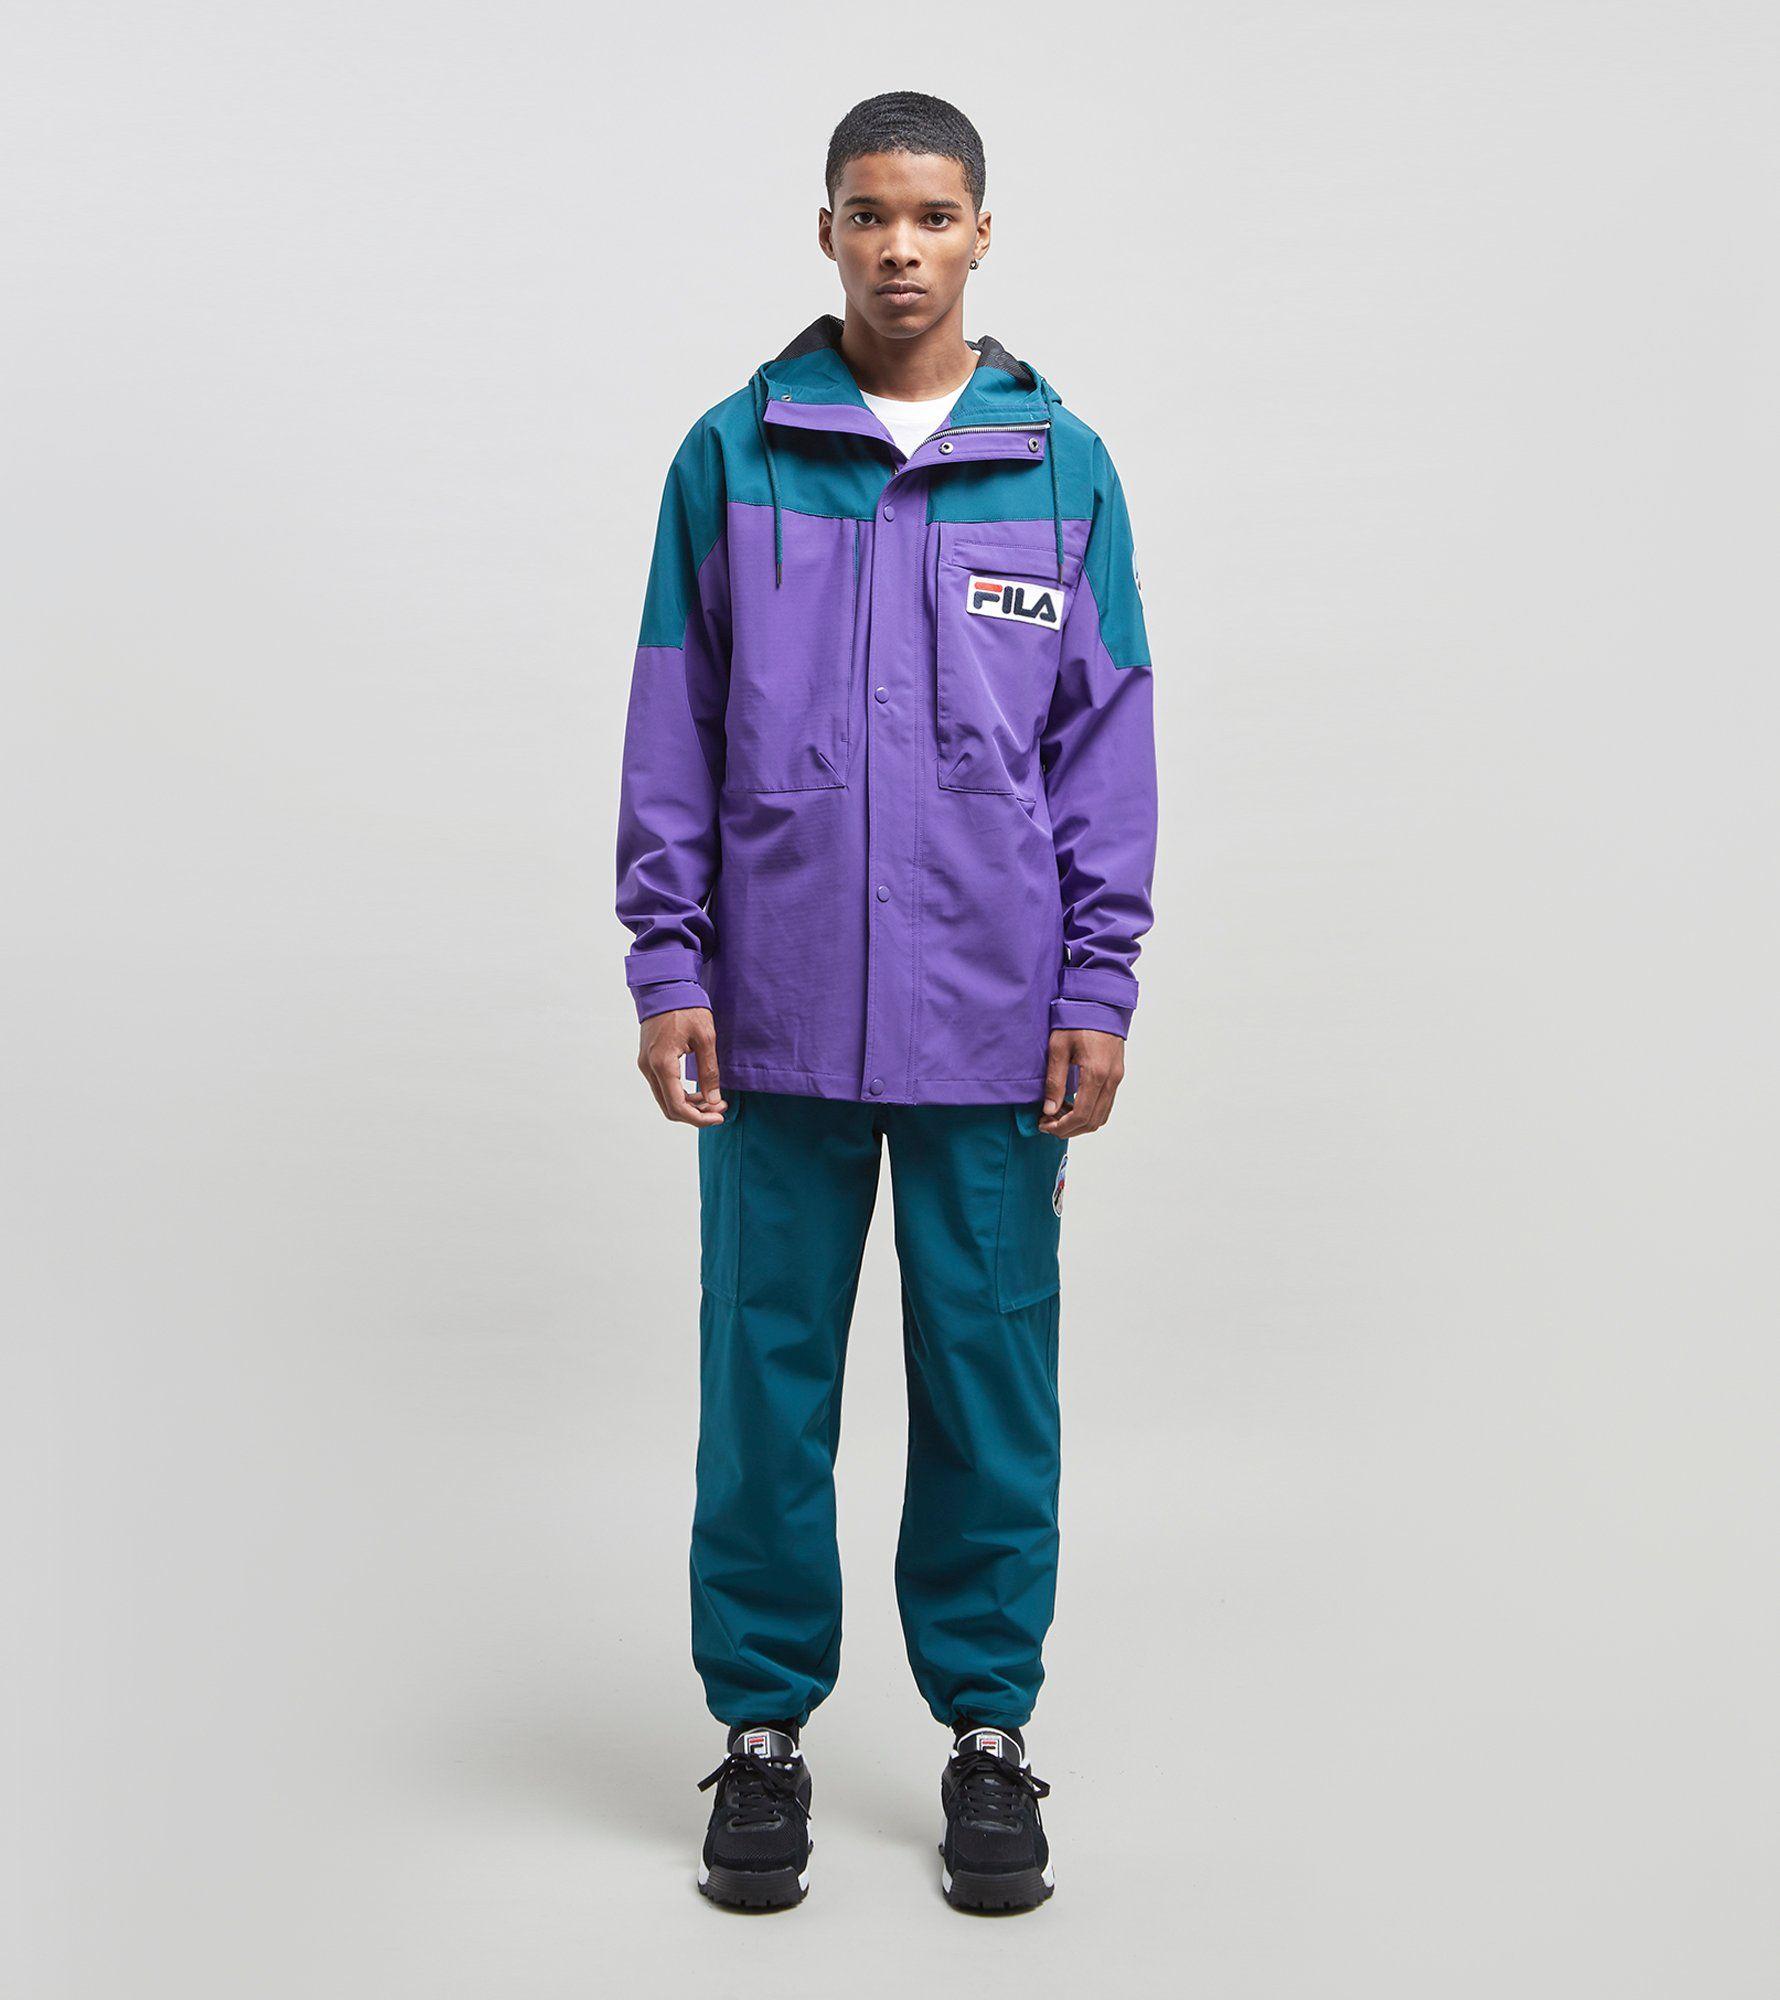 Fila Youla Cargo Pants - size? Exclusive